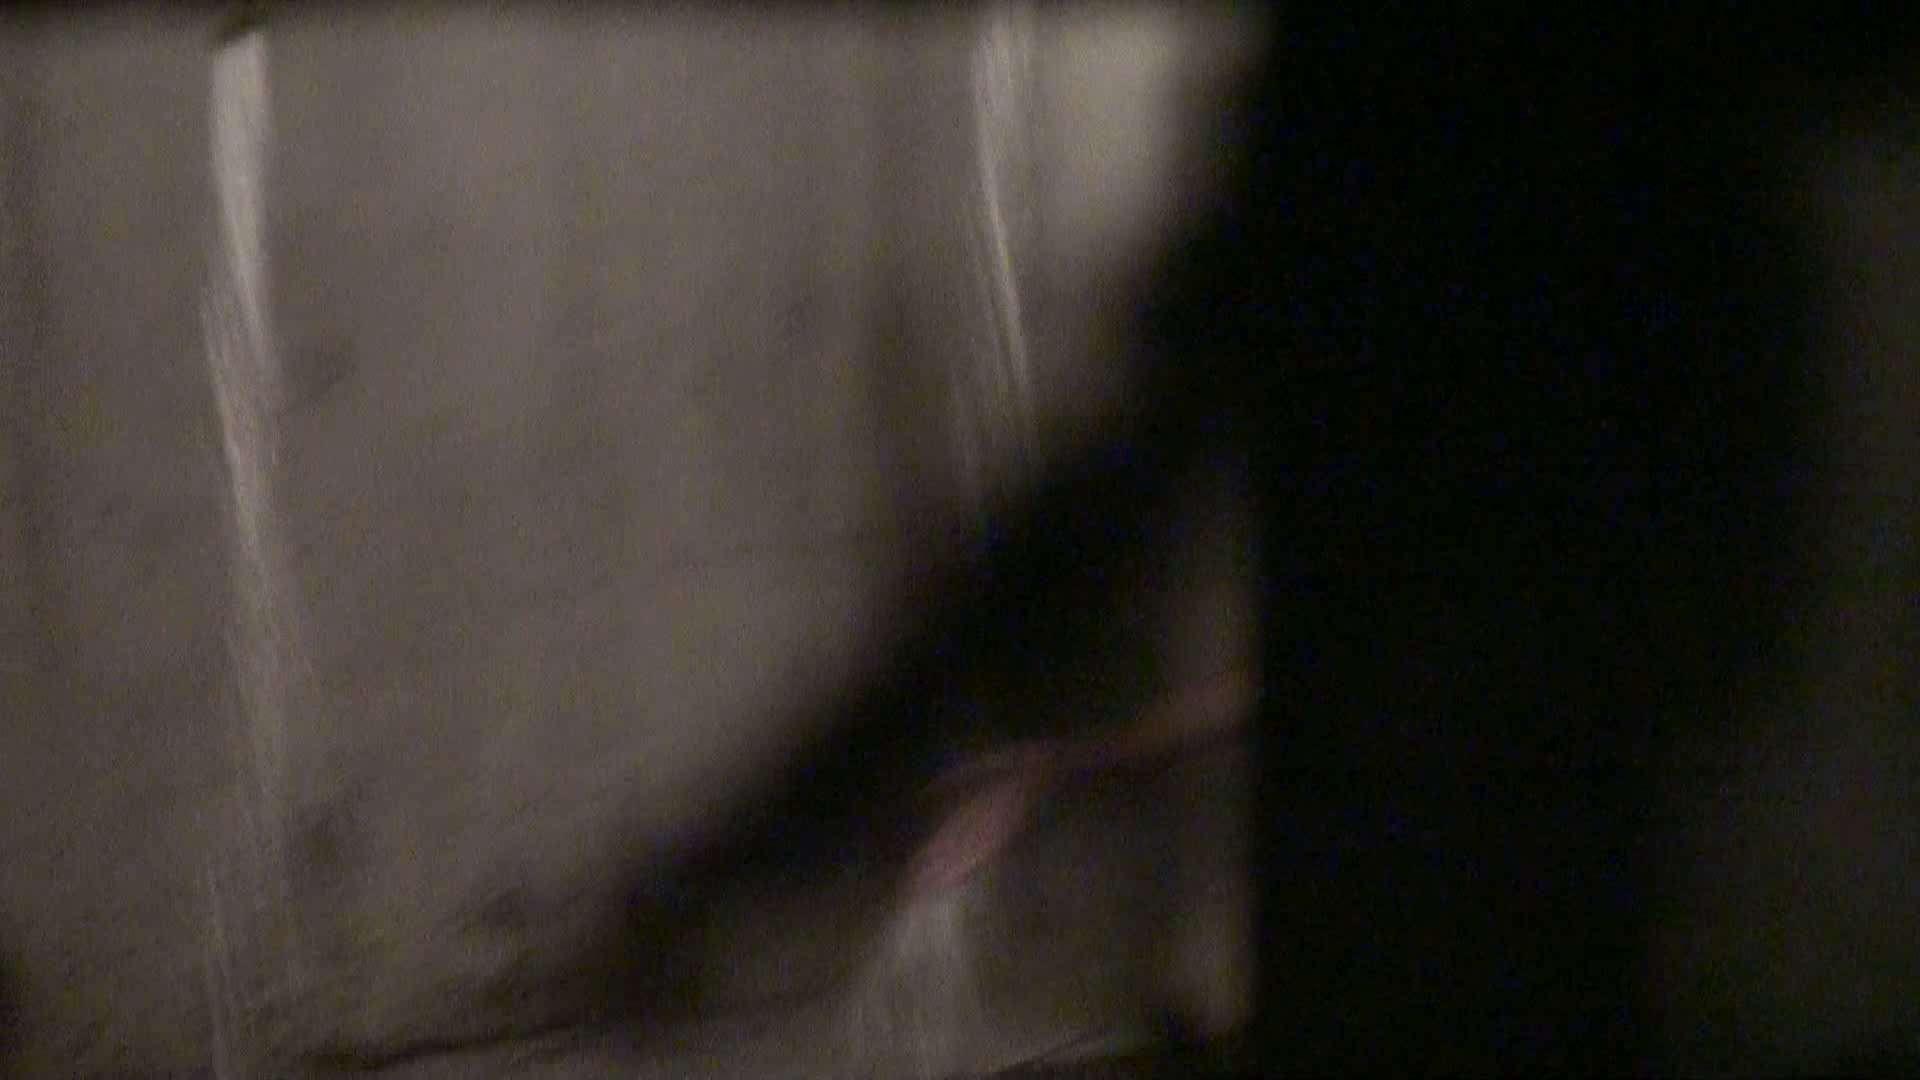 Aquaな露天風呂Vol.356 盗撮 | OLセックス  85画像 28